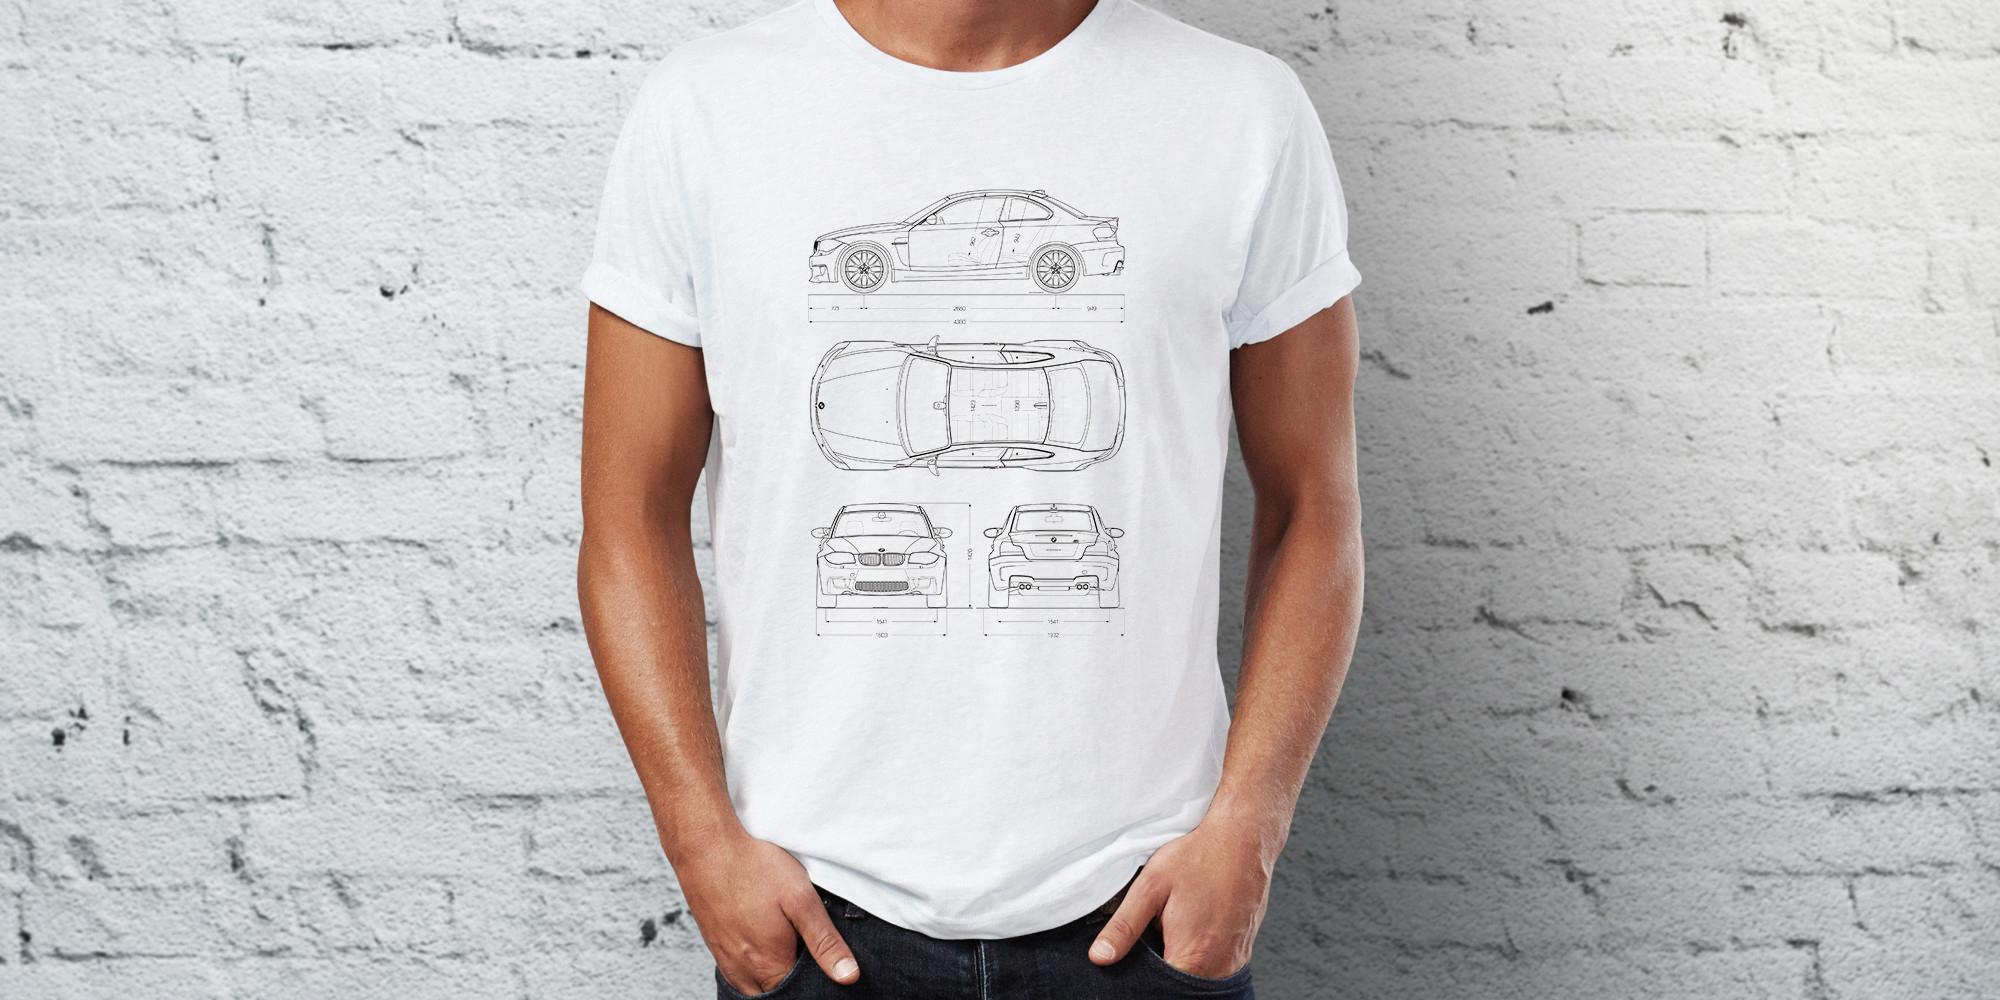 e82 1 Series Shirt.jpg